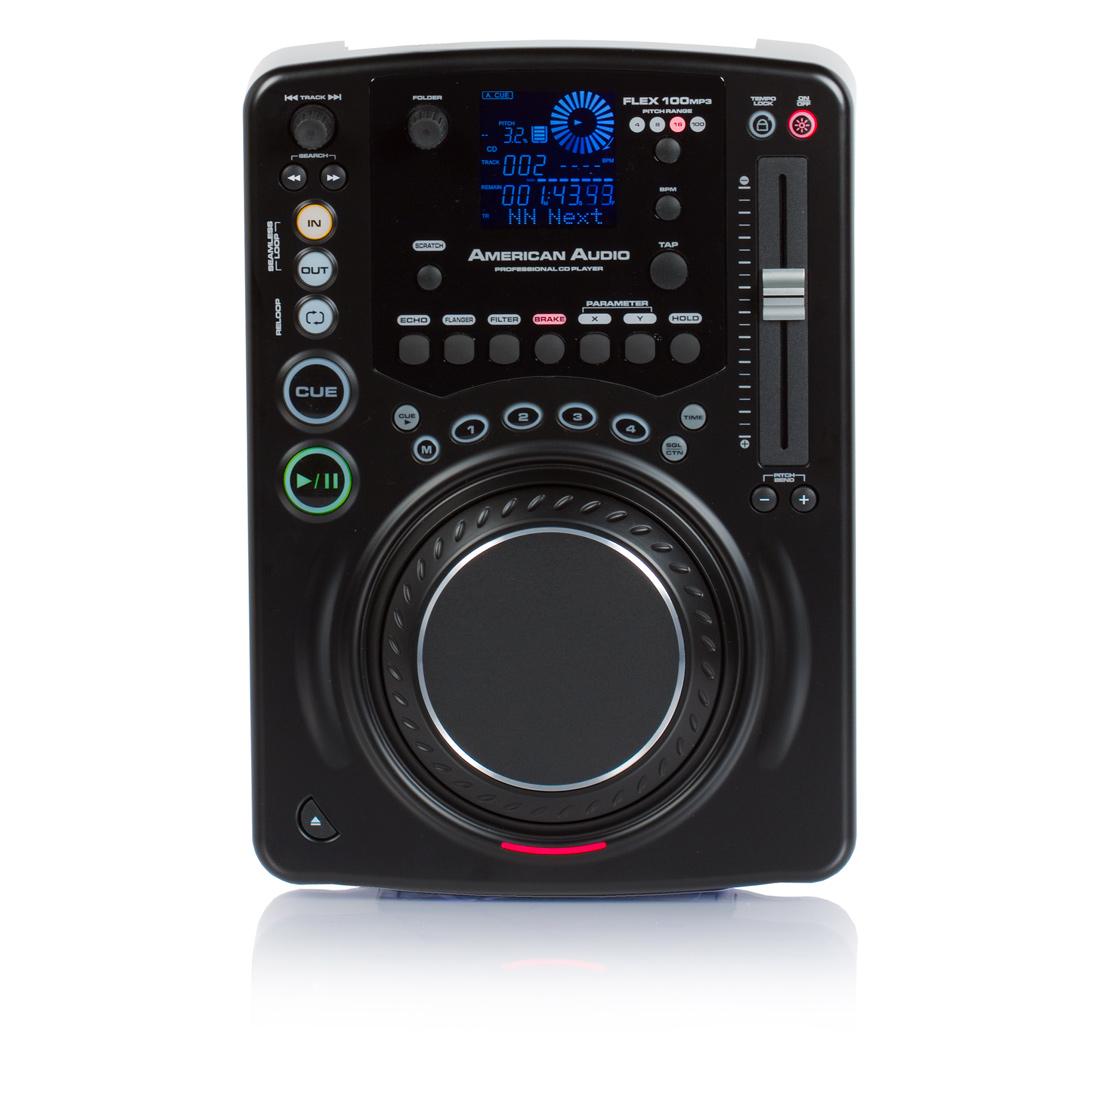 Flex100 MP3